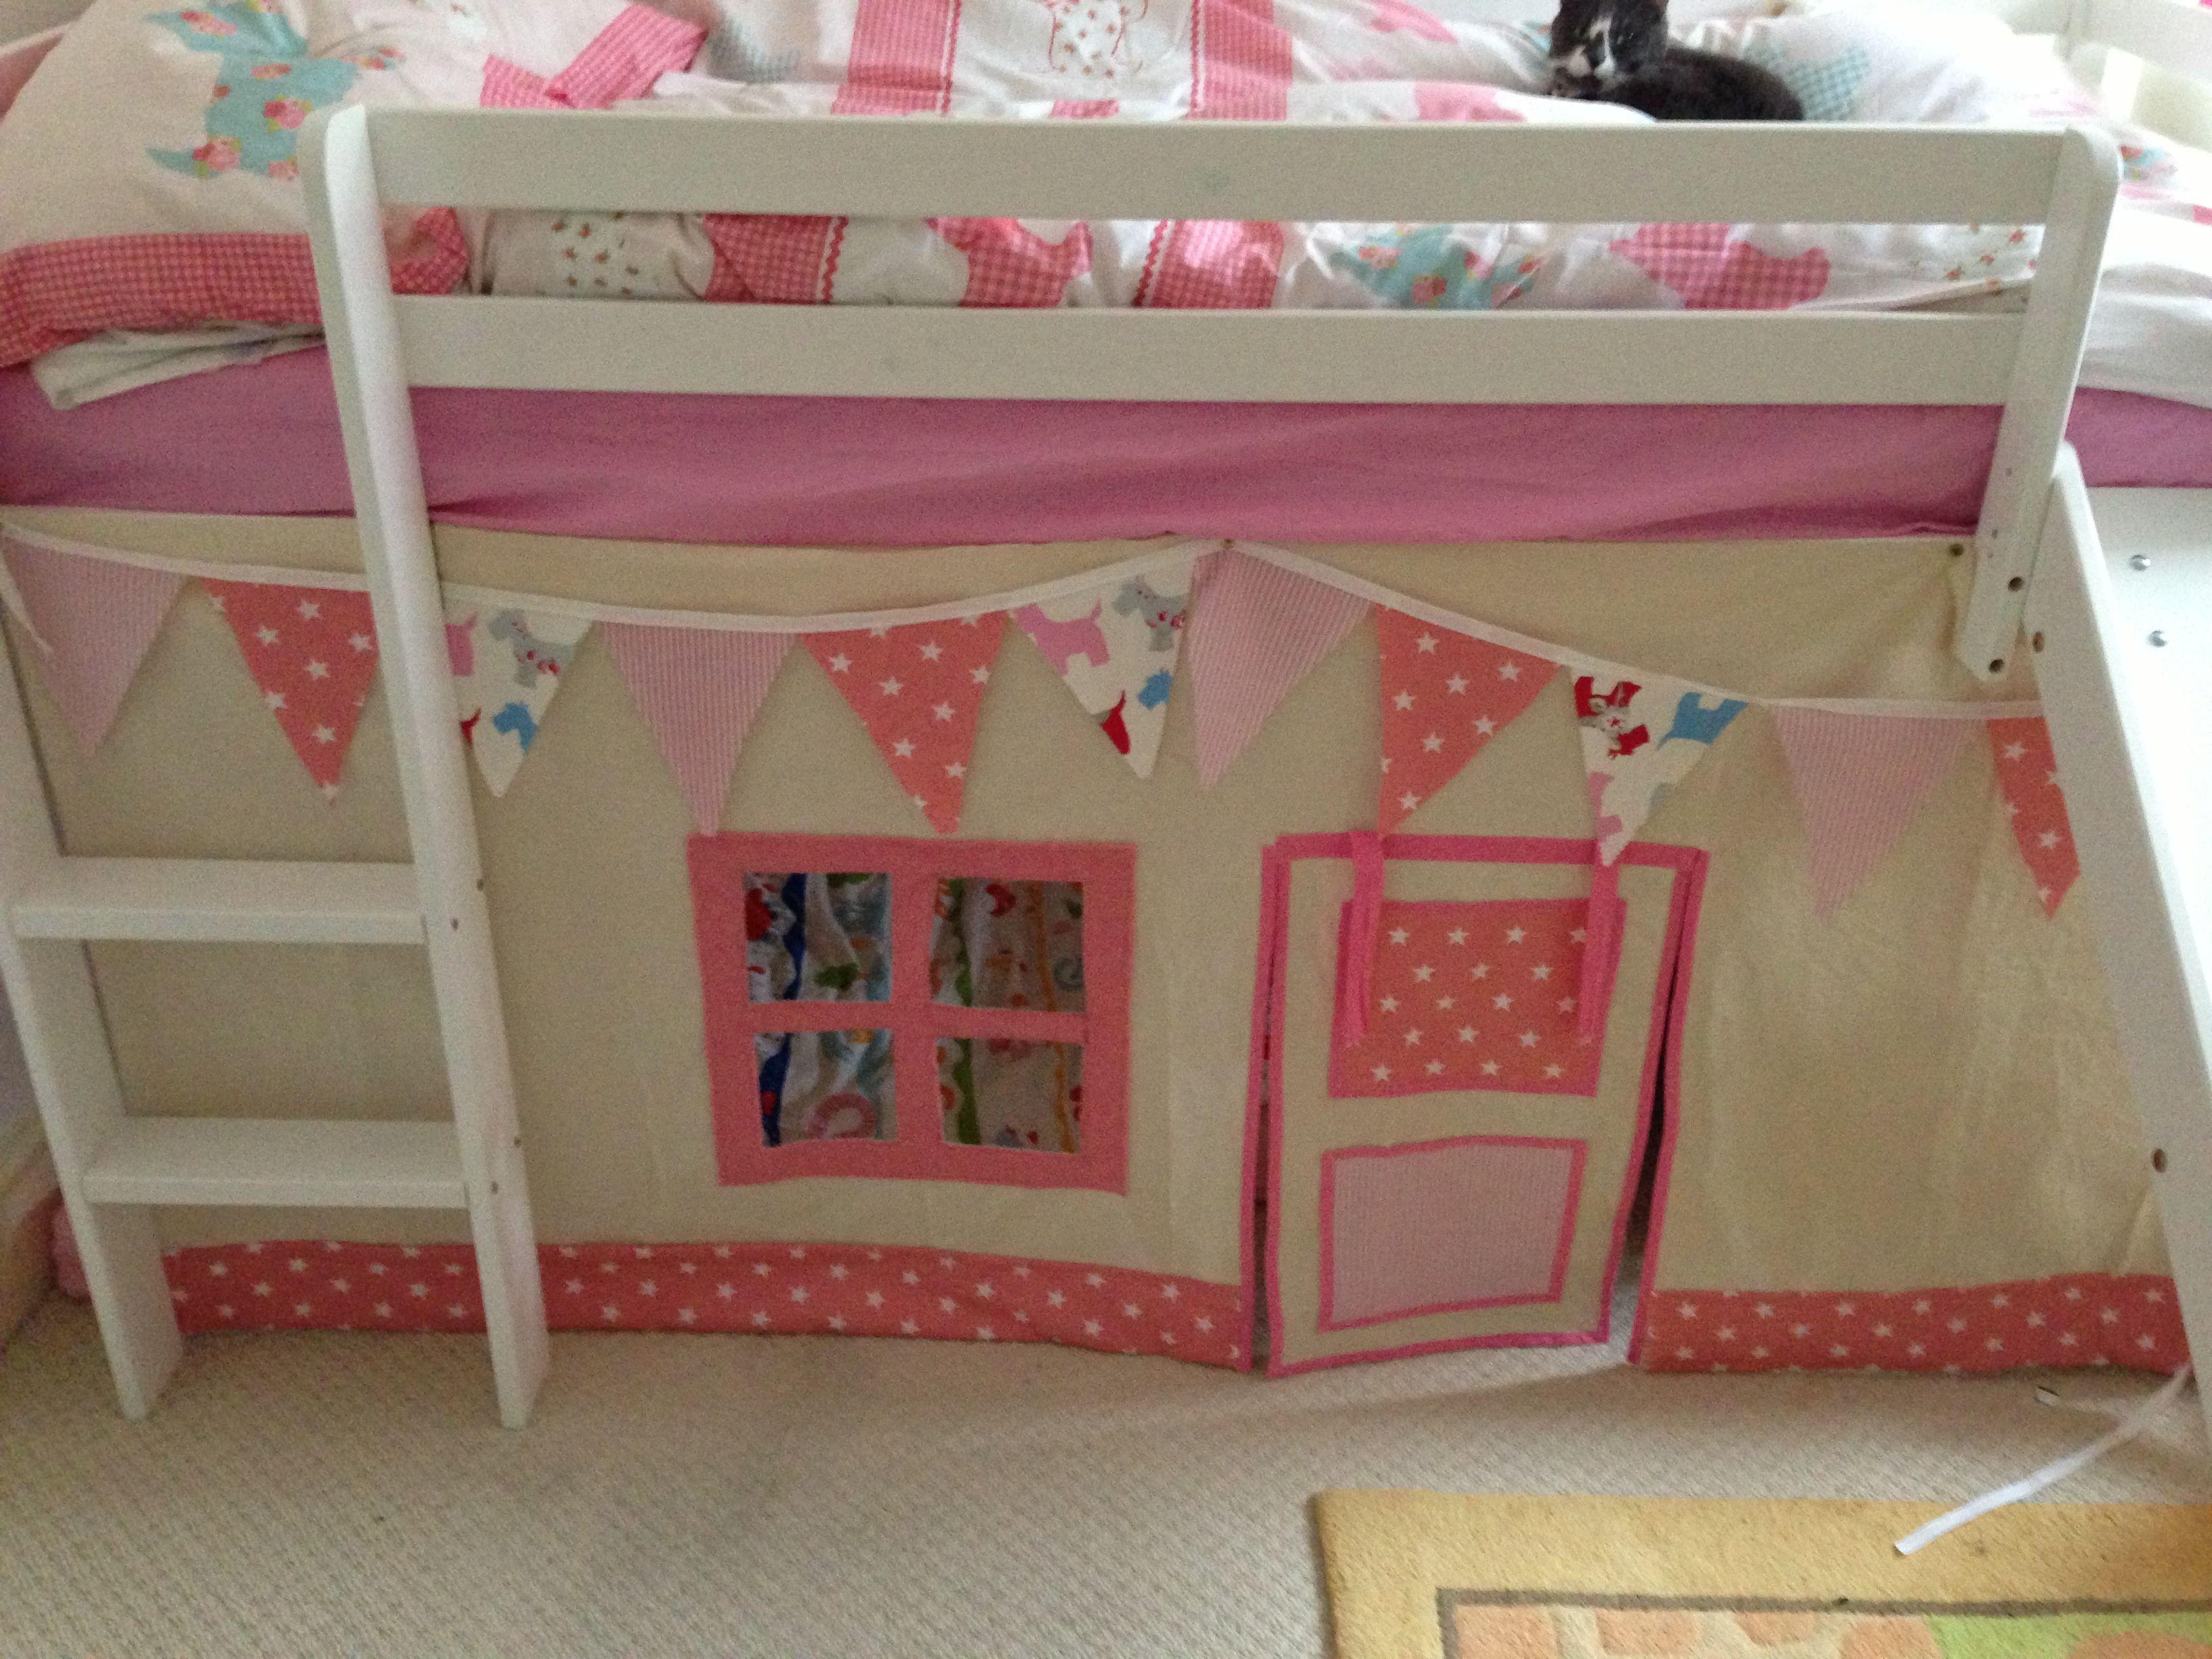 Mid Sleeper Canvas Tent Bed Tent Girls Bunk Beds Kids